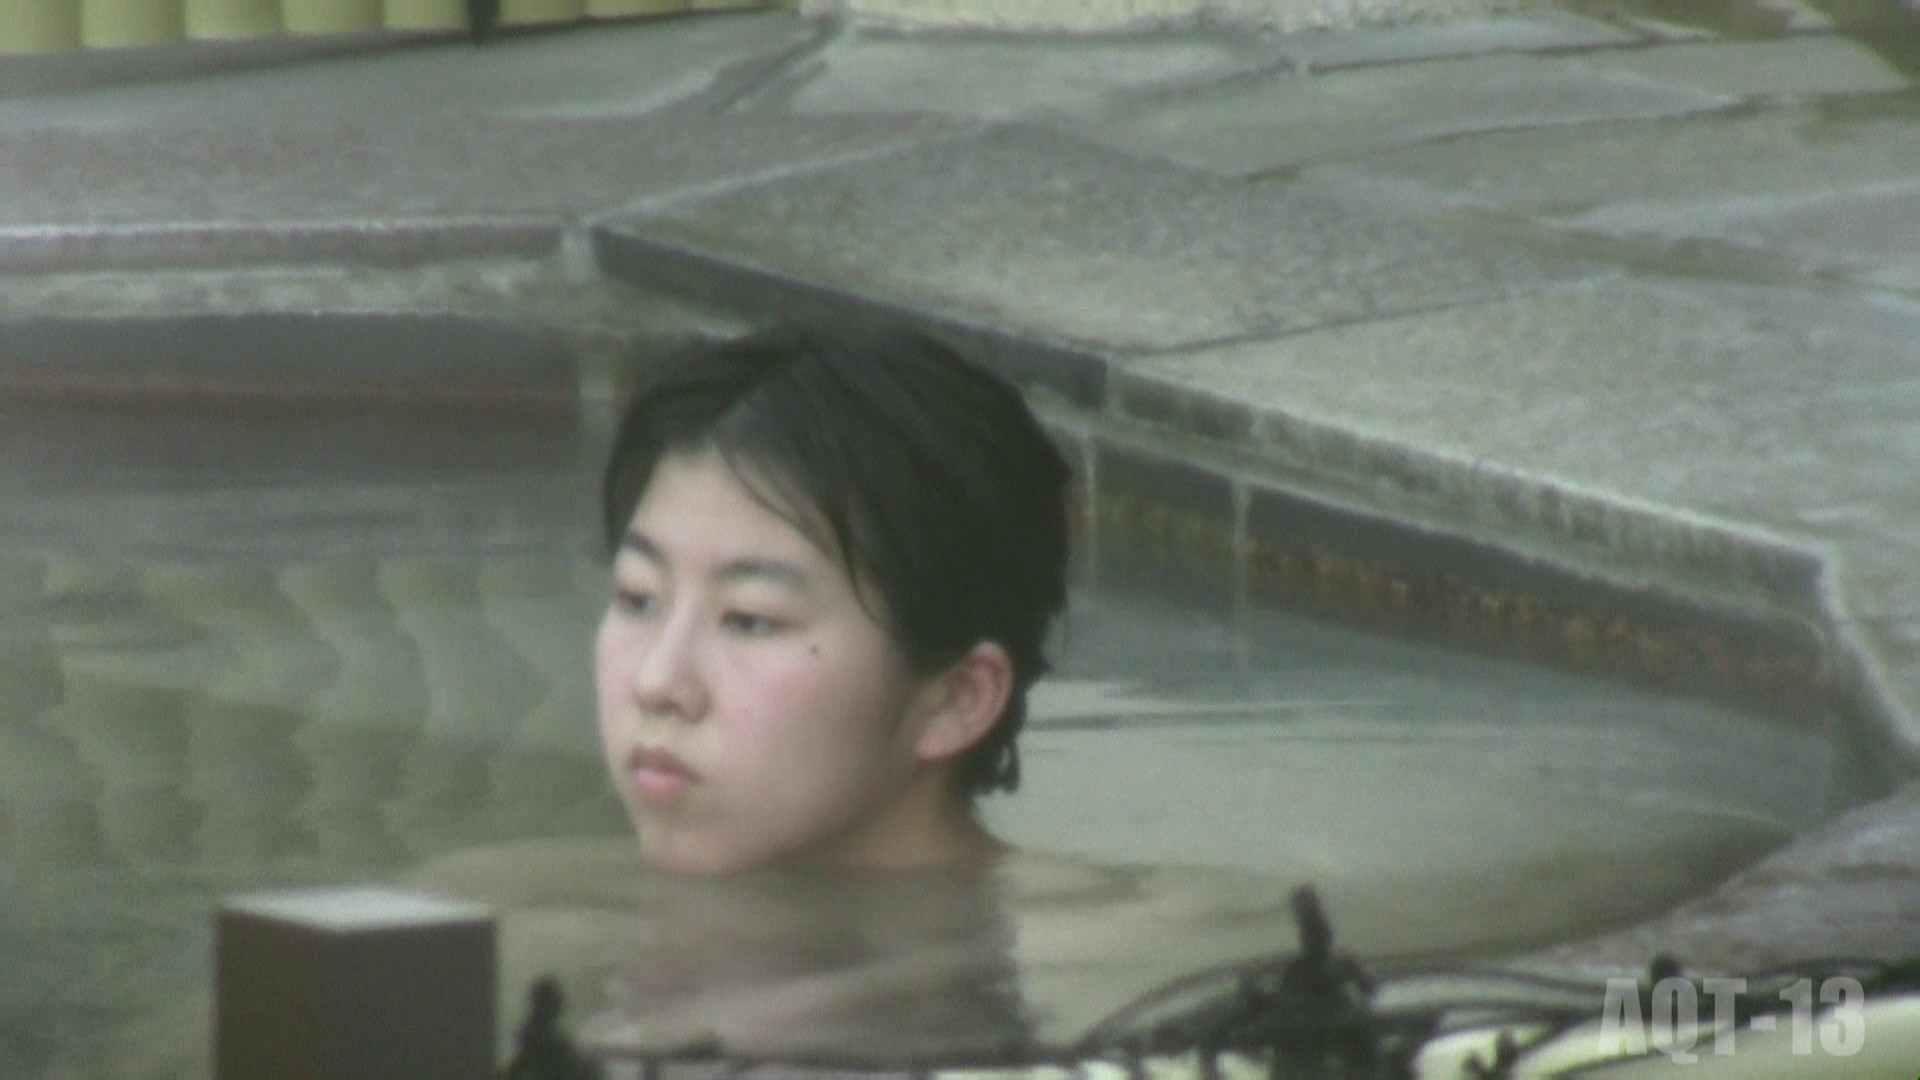 Aquaな露天風呂Vol.816 露天  53連発 22